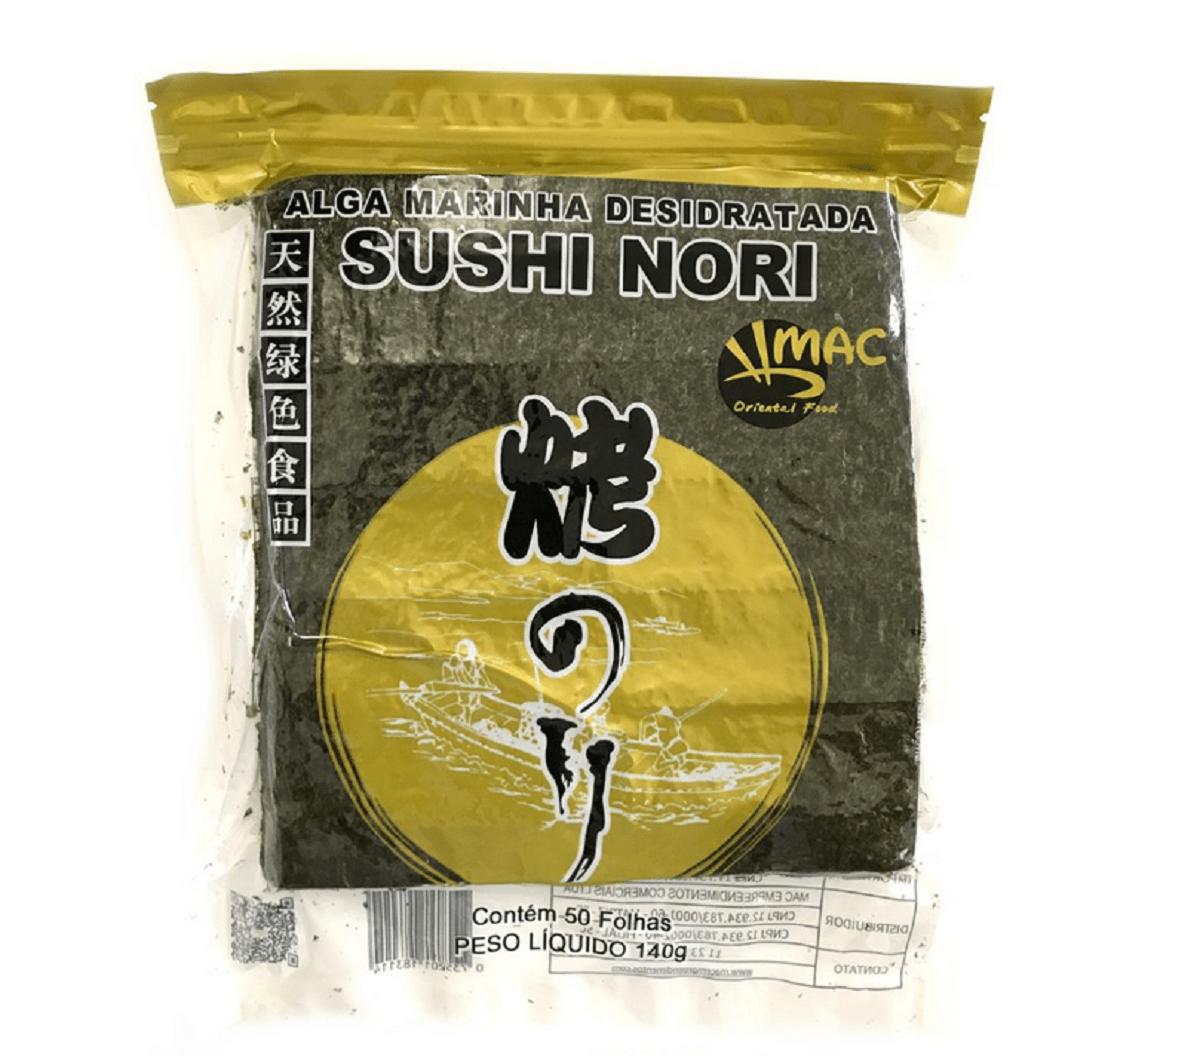 Alga Marinha Nori para Sushi e Temakis C/50 Folhas Yaki Sushi Nori Gold Brand  MAC - 140 gramas